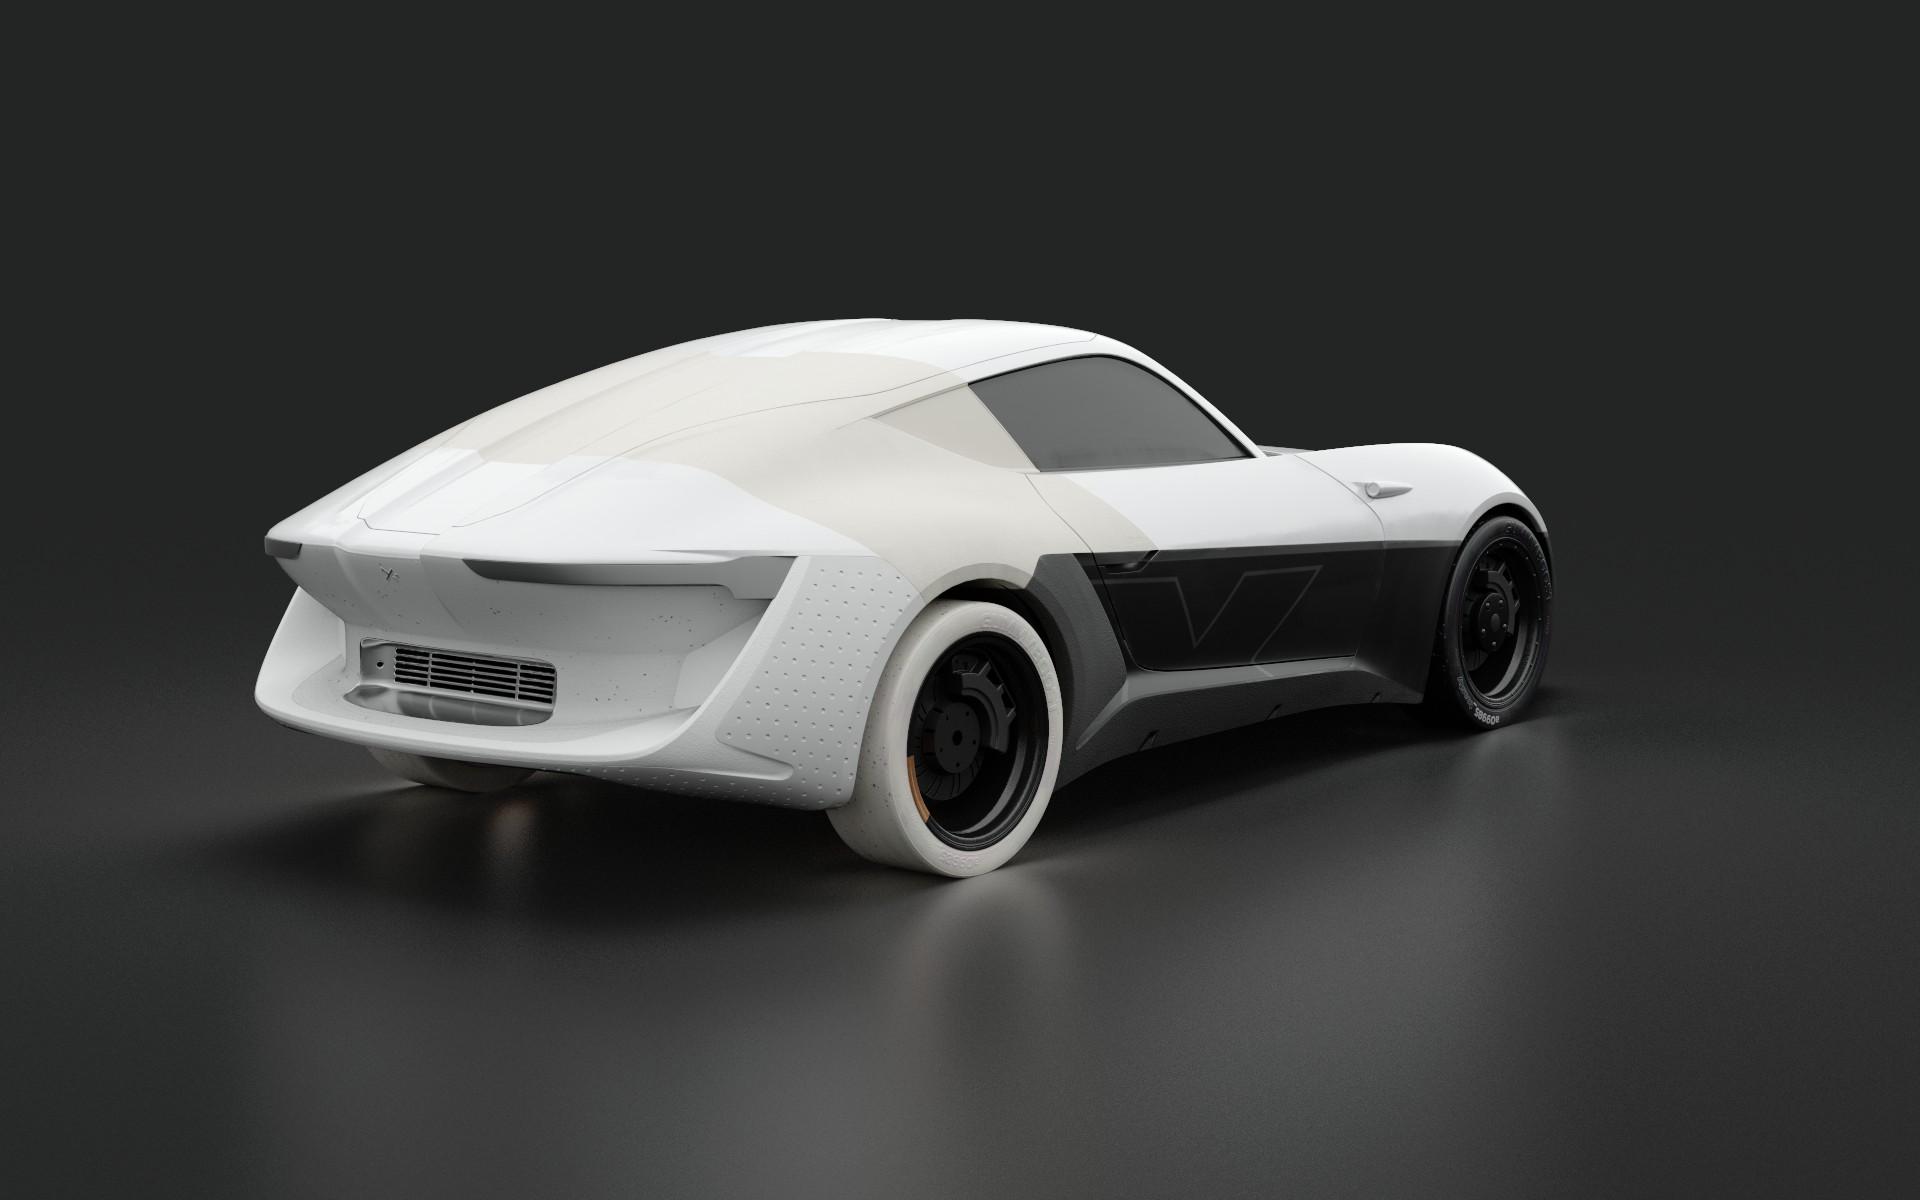 thomas charier xtaon 3D texturing contest substance painter concept car back